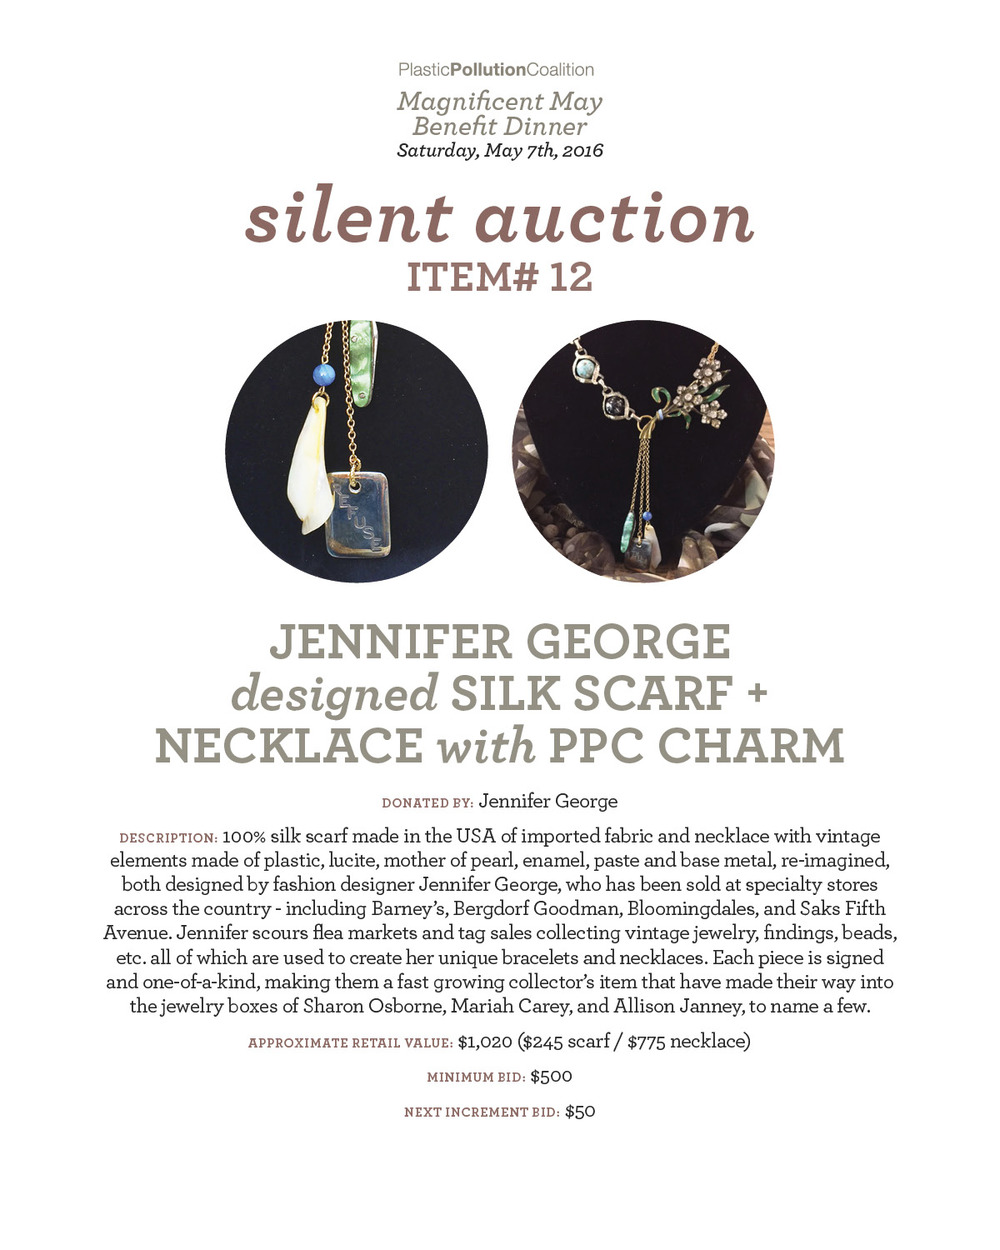 j. george scarf + necklace